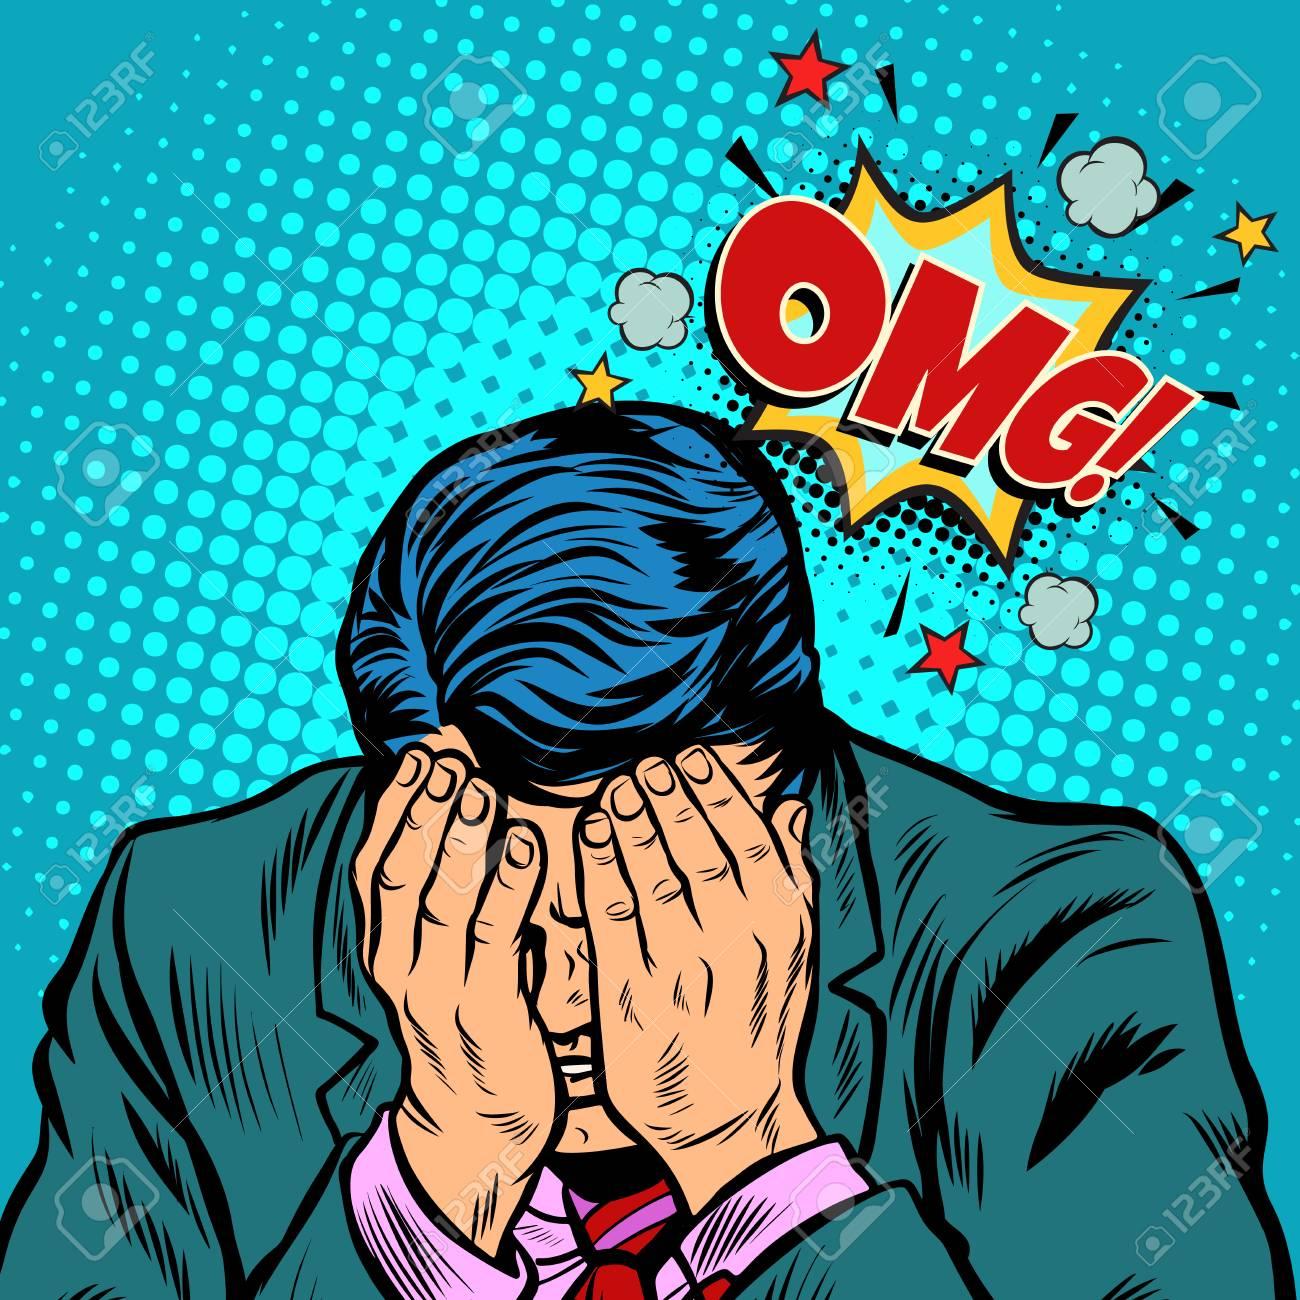 OMG shame businessman. Pop art retro vector illustration cartoon comics kitsch drawing - 101064410